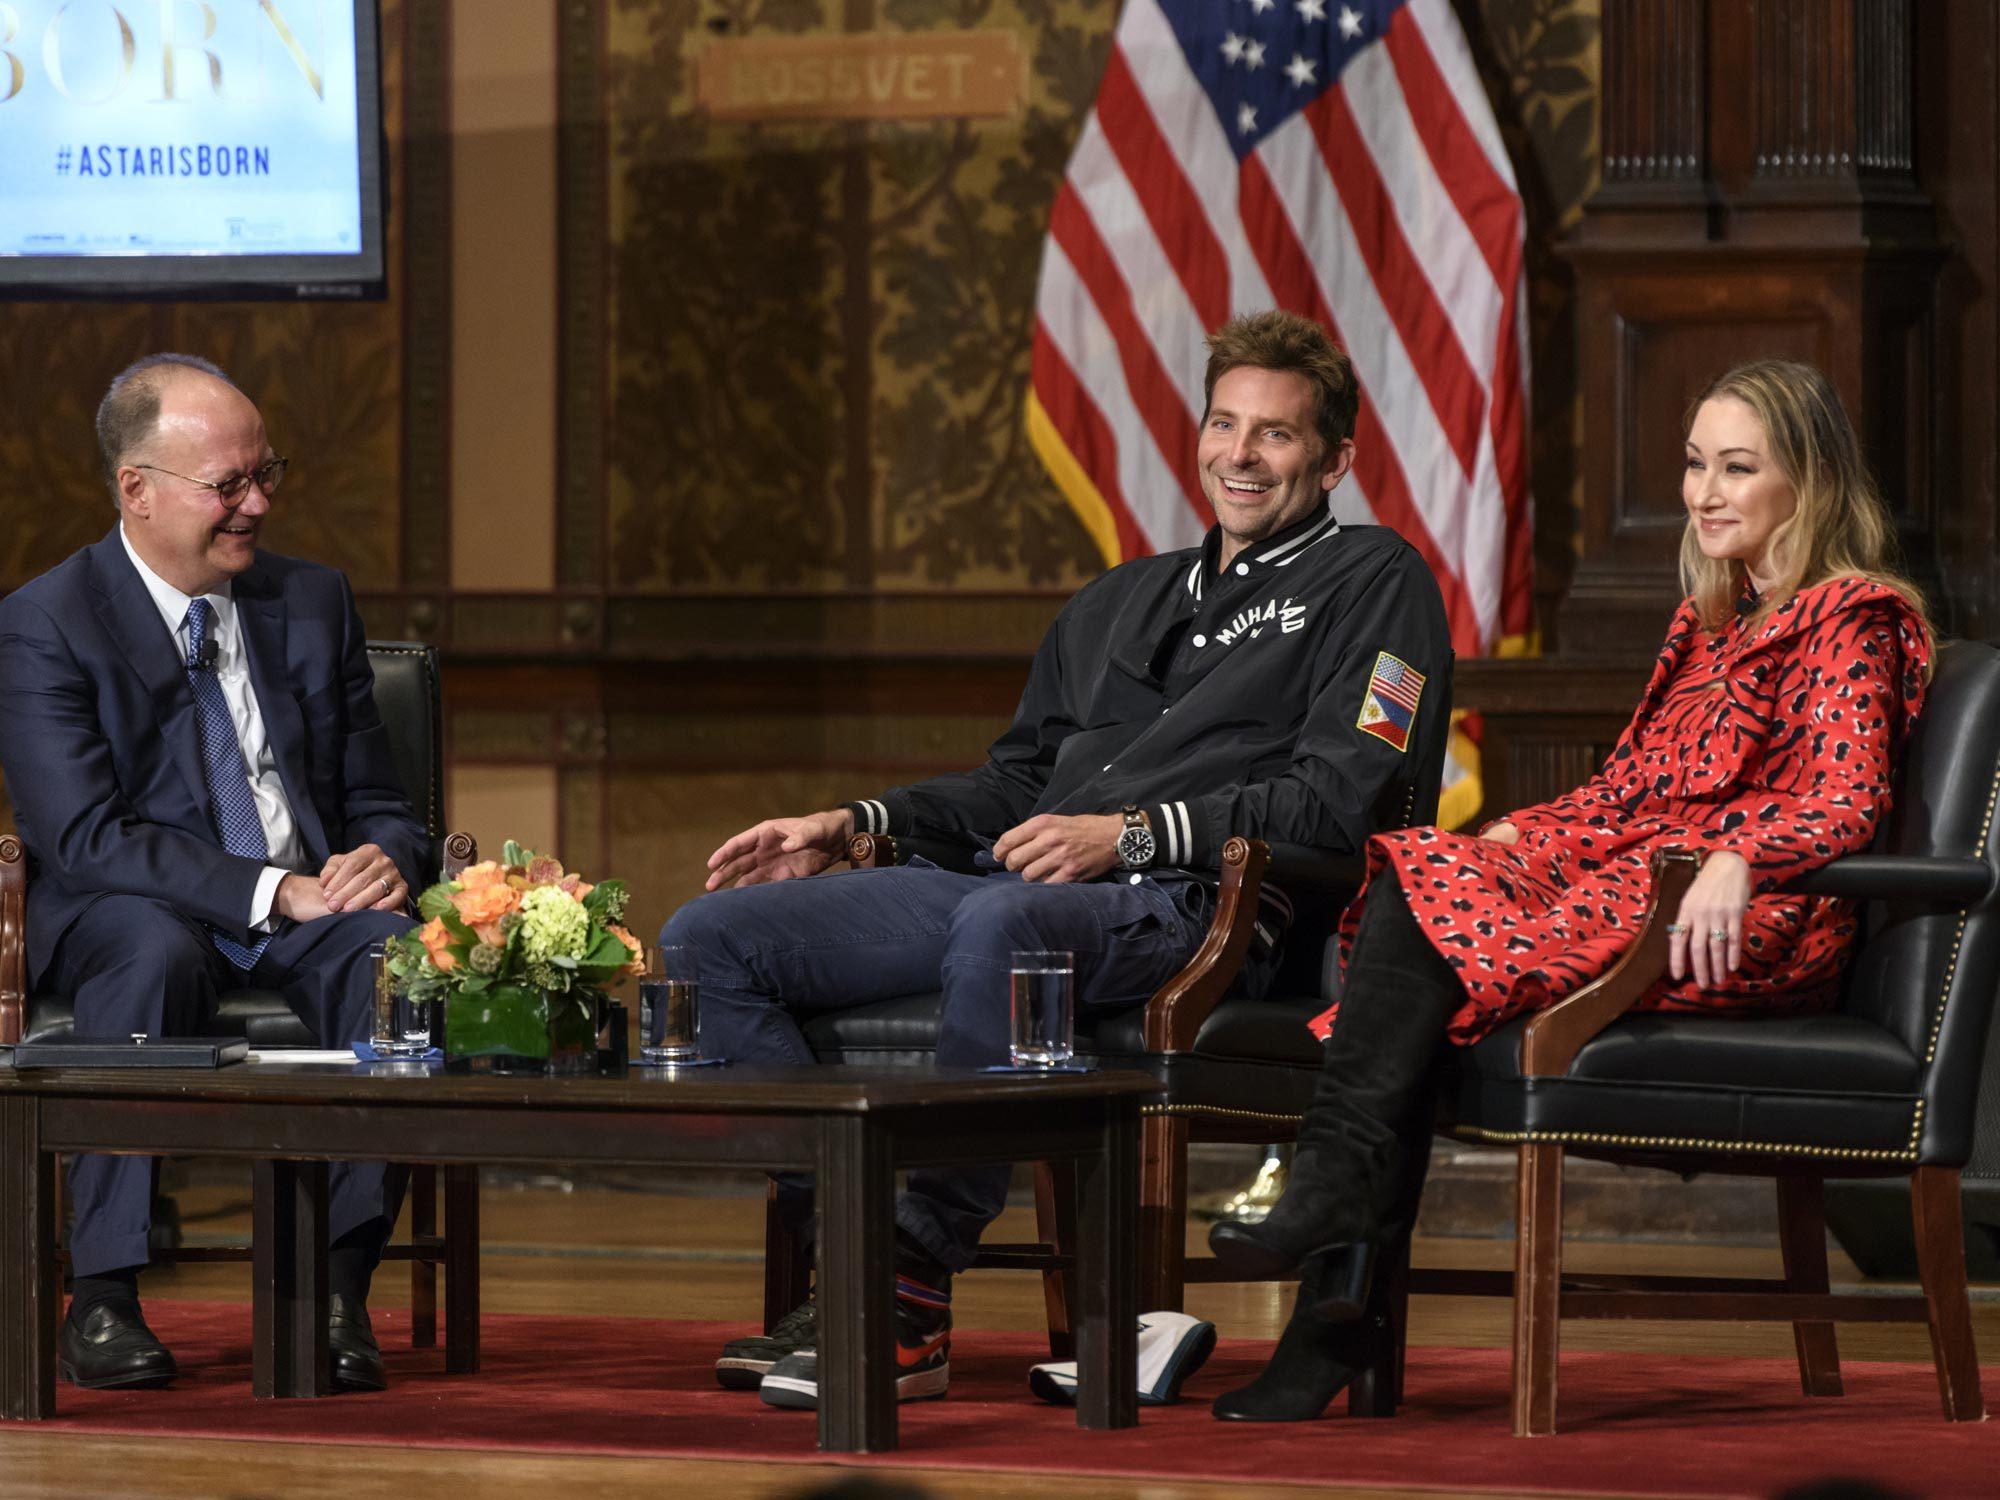 Bradley Cooper speaks in Gaston Hall